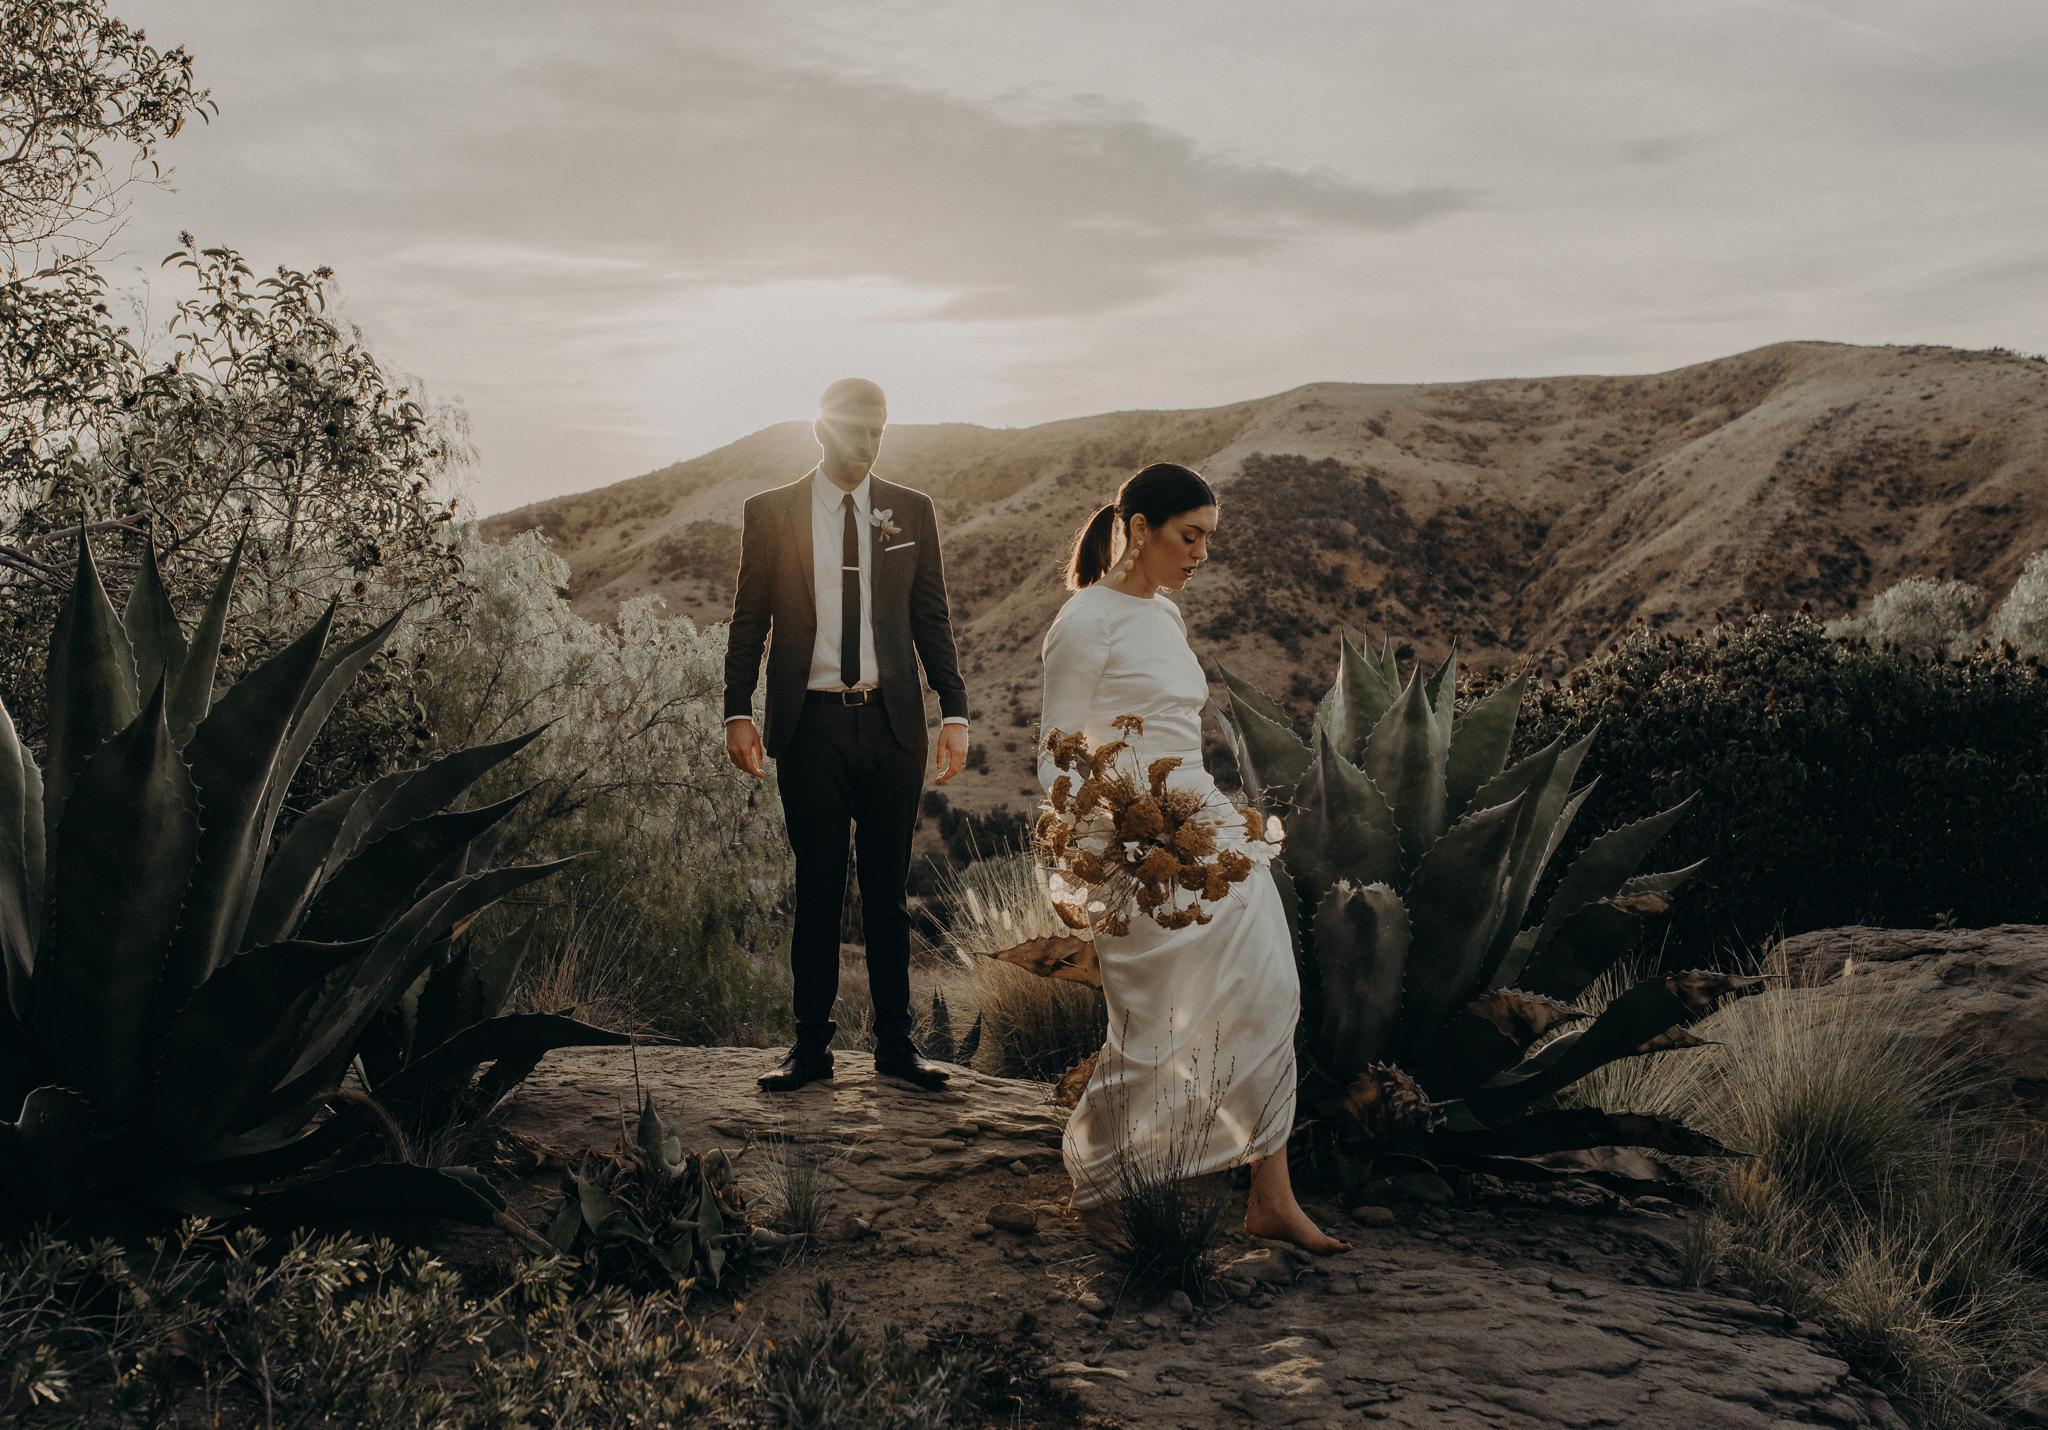 Hummingbird Nest Ranch Wedding - Wedding Photographer in Los Angeles - IsaiahAndTaylor.com-071.jpg